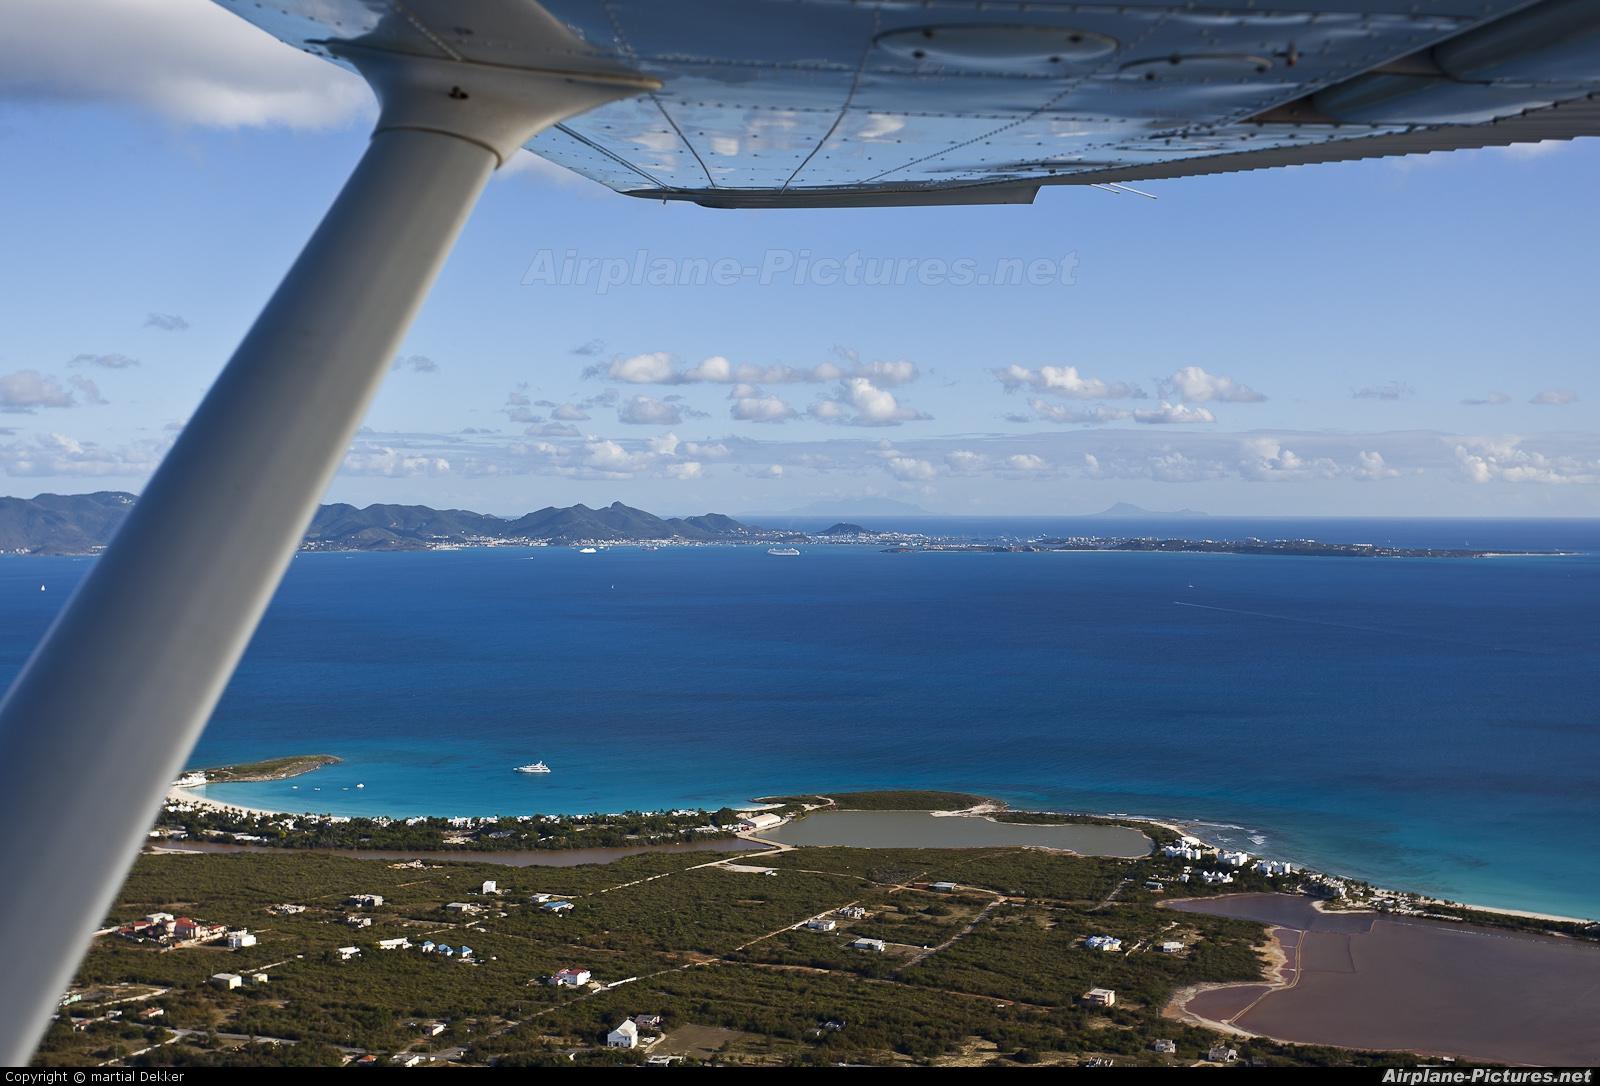 Saint-Martin Aéro F-OIJC aircraft at In Flight - Anguilla